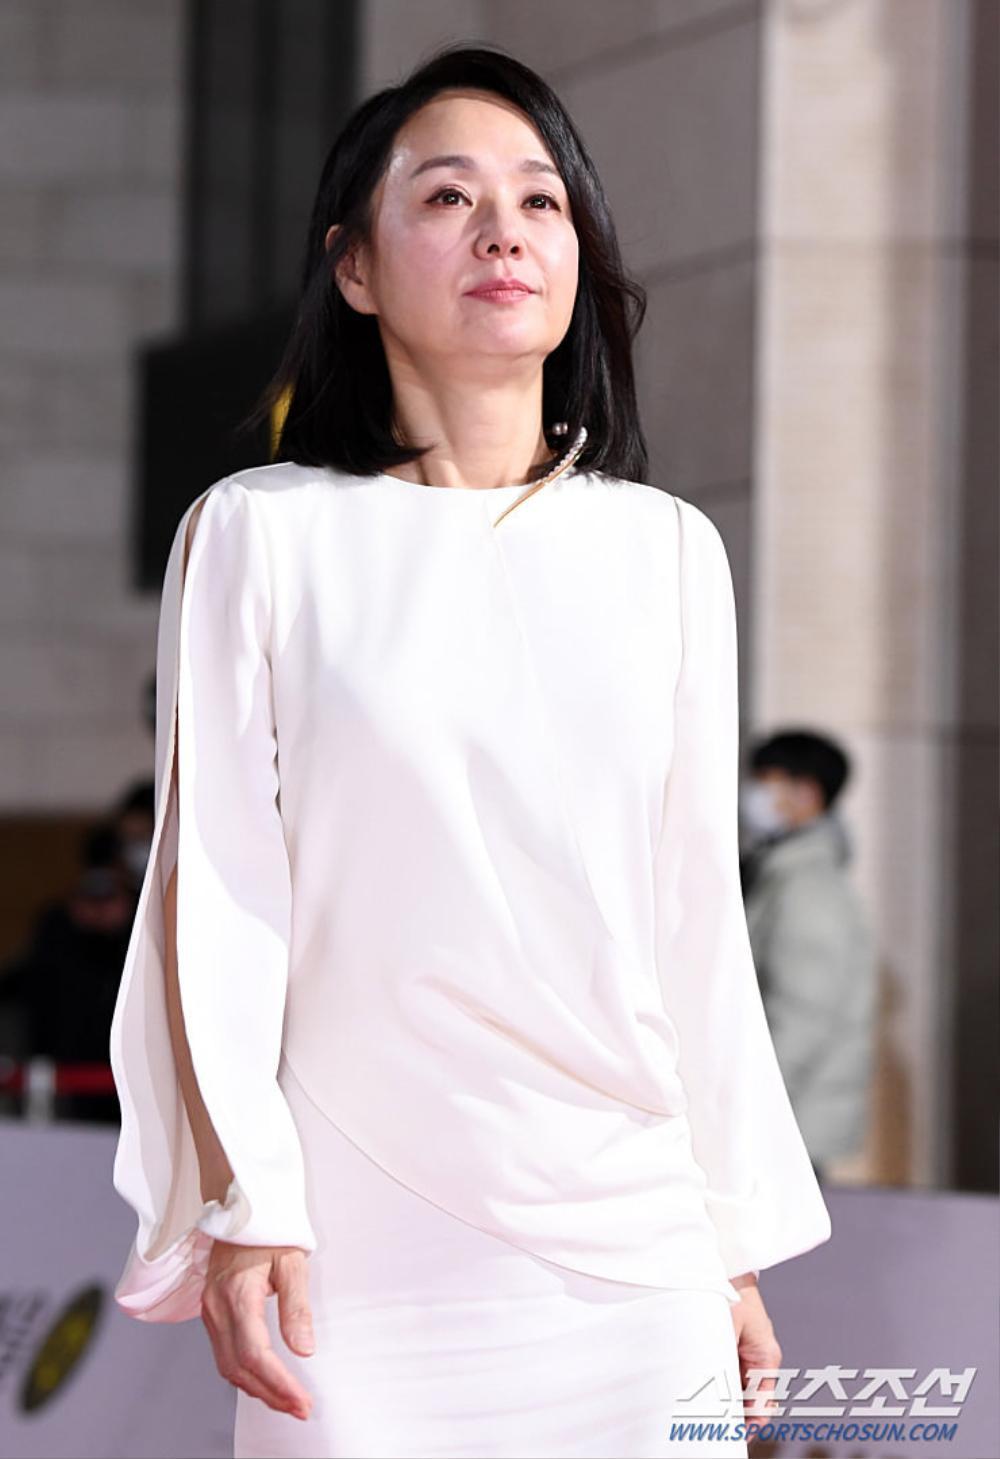 Thảm đỏ 'Rồng xanh 2020': Shin Hye Sun 'cân sắc' Shin Min Ah, Jung Woo Sung - Lee Byung Hun điển trai! Ảnh 12